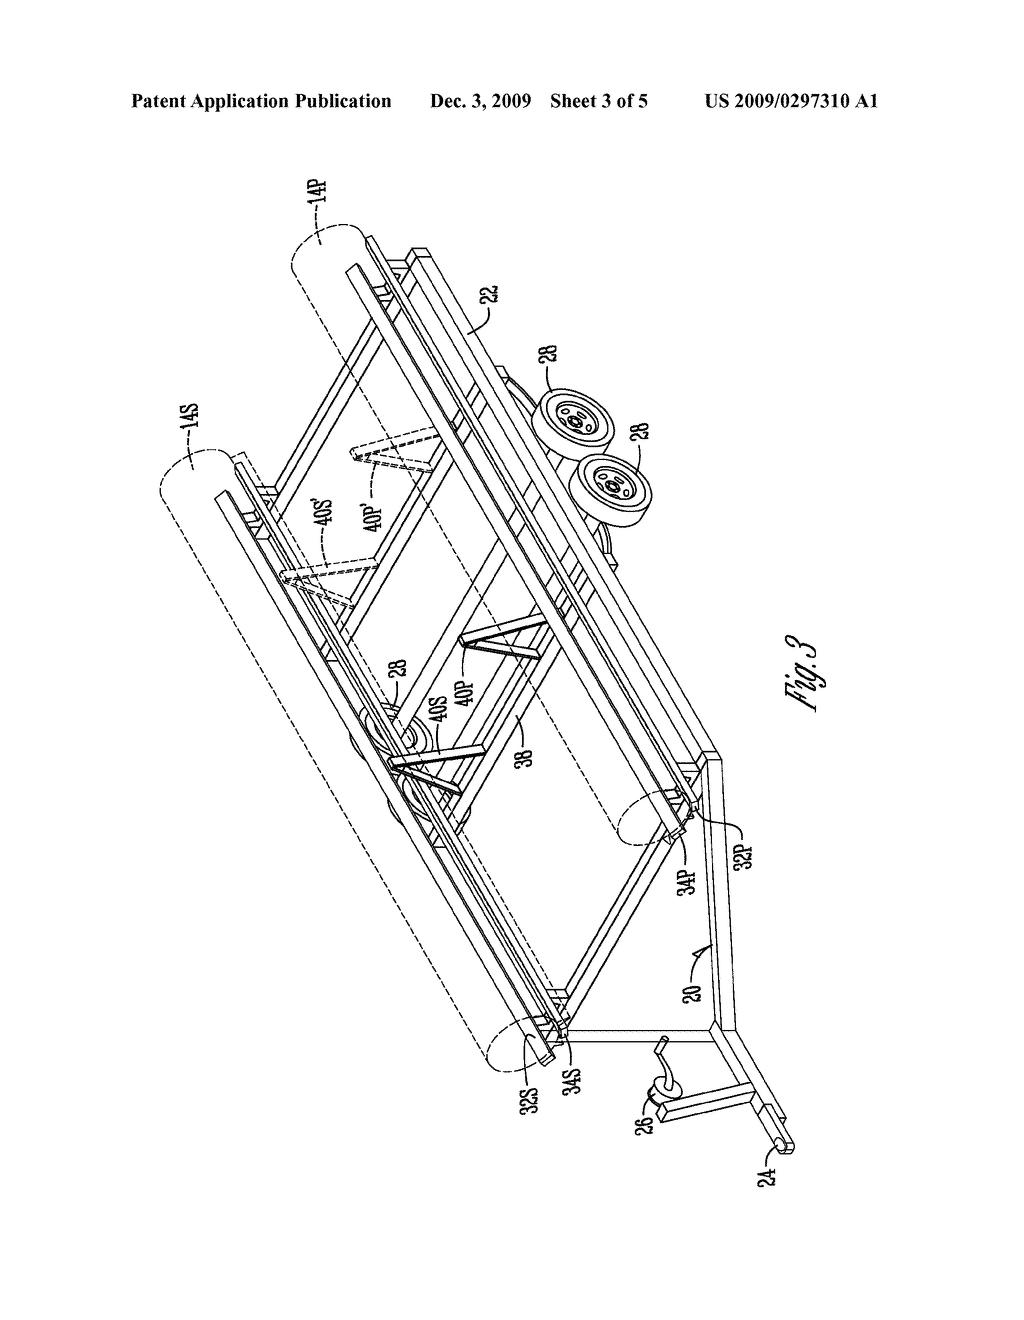 hight resolution of pontoon boat trailer guide diagram schematic and image 04 bennington pontoon boat wiring diagram pontoon boat diagram